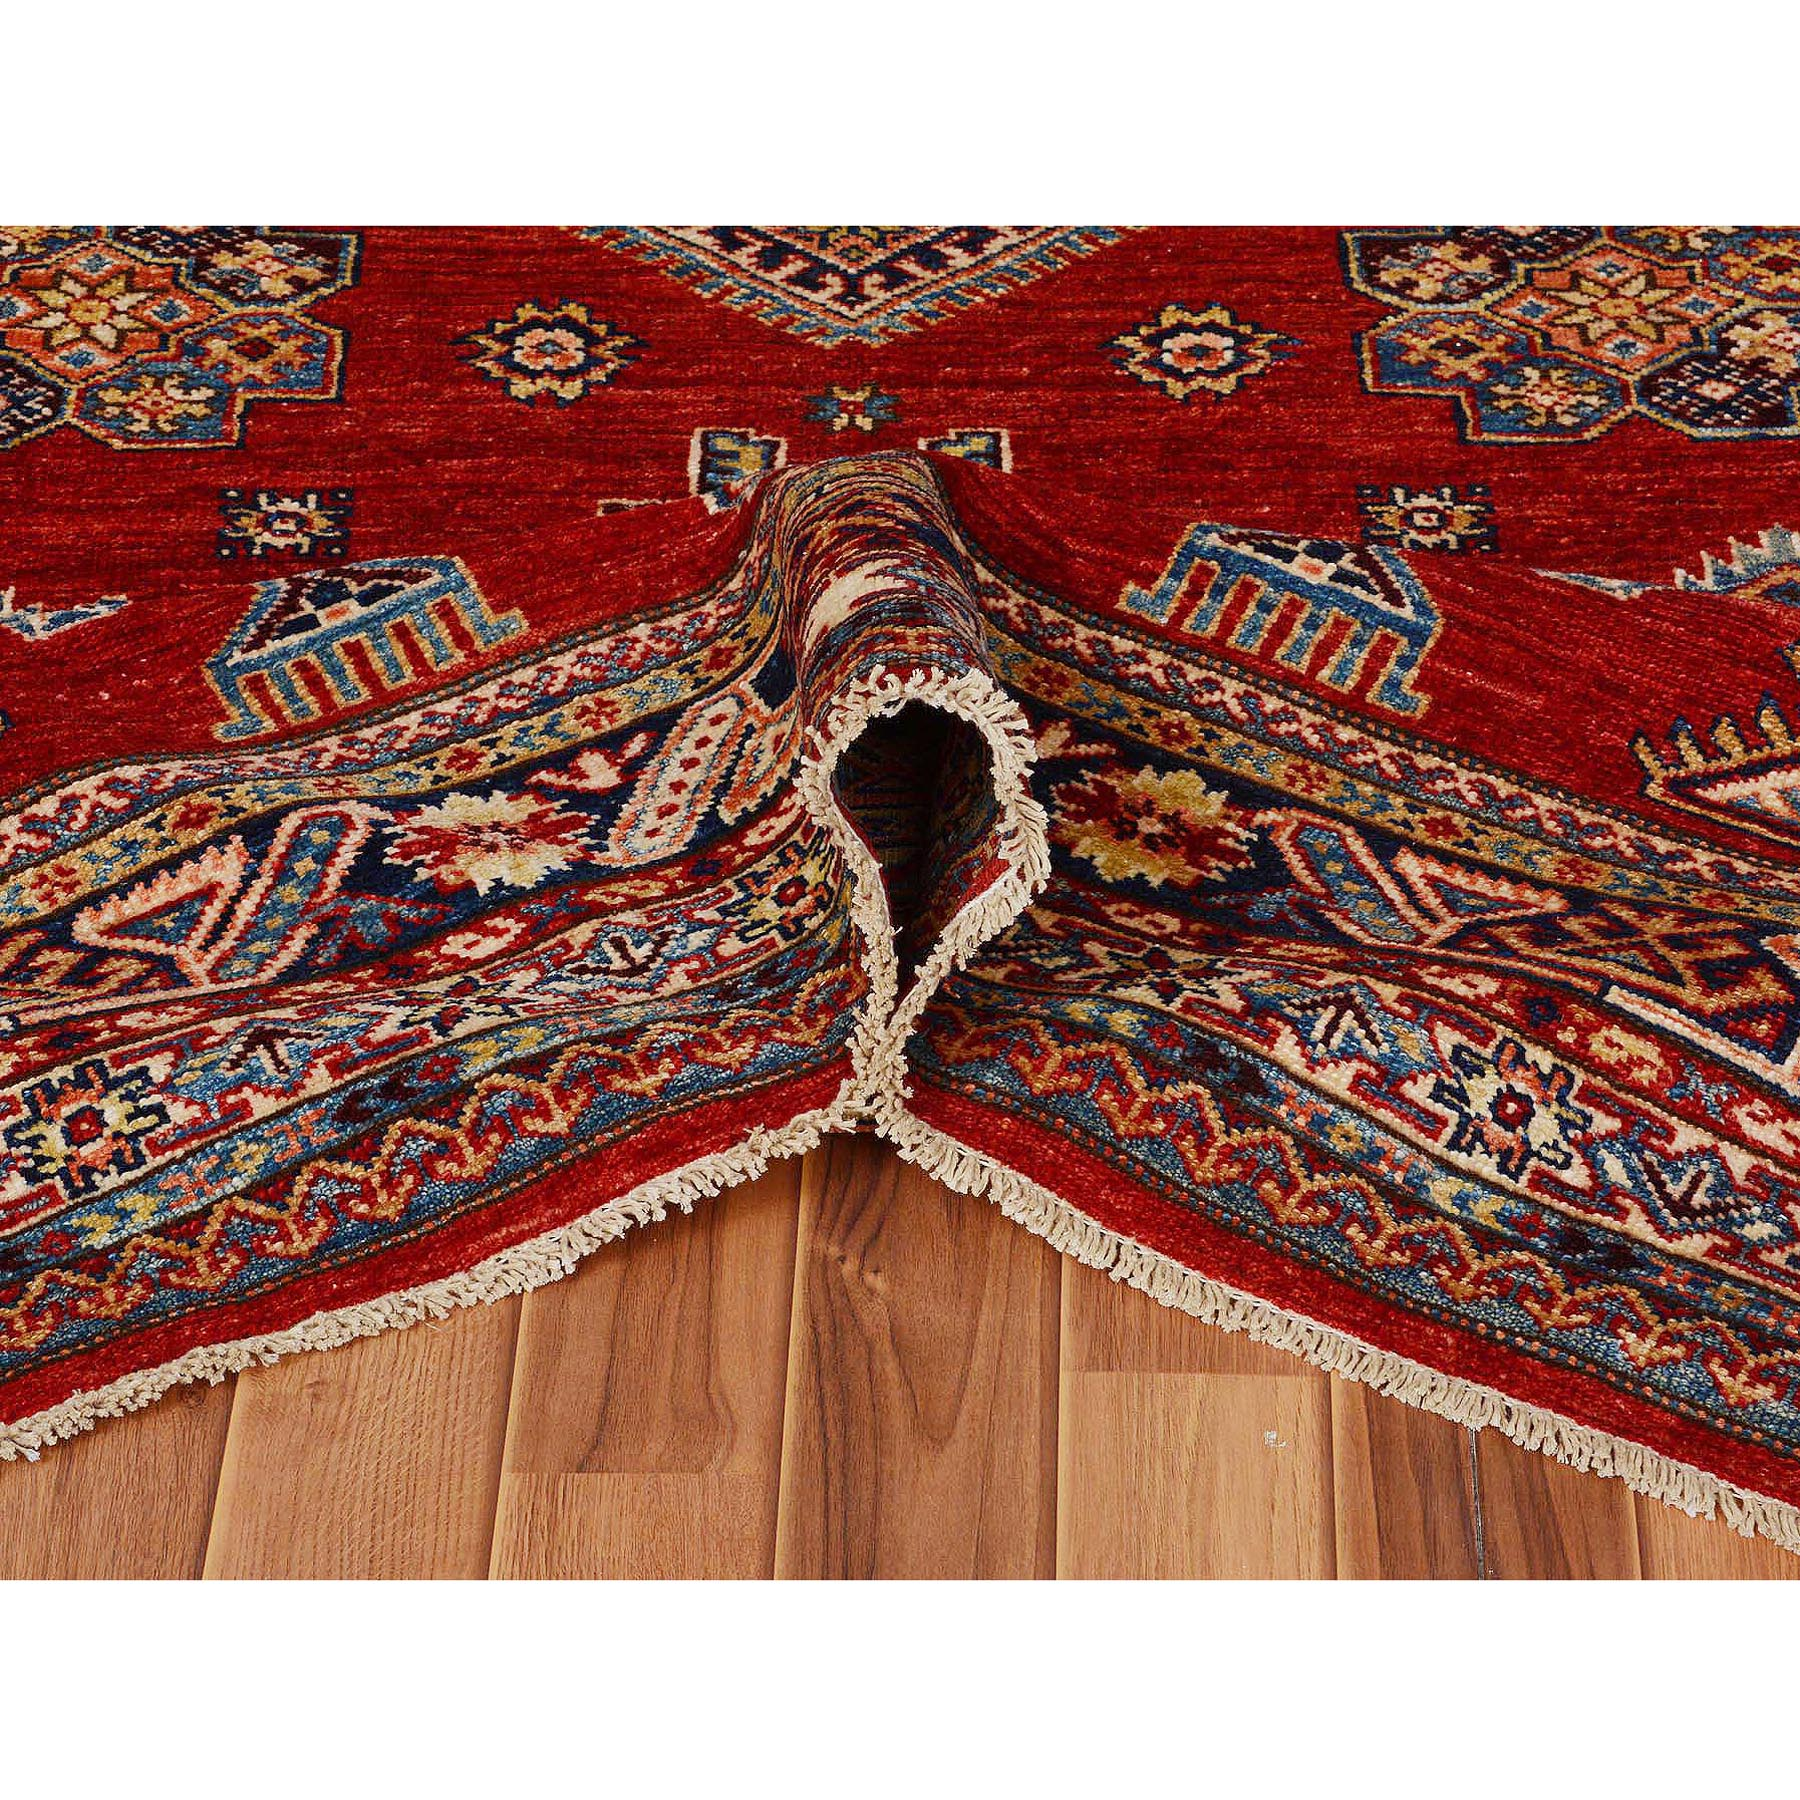 6'x9' Red Super Kazak Pure Wool Geometric Design Hand Knotted Oriental Rug